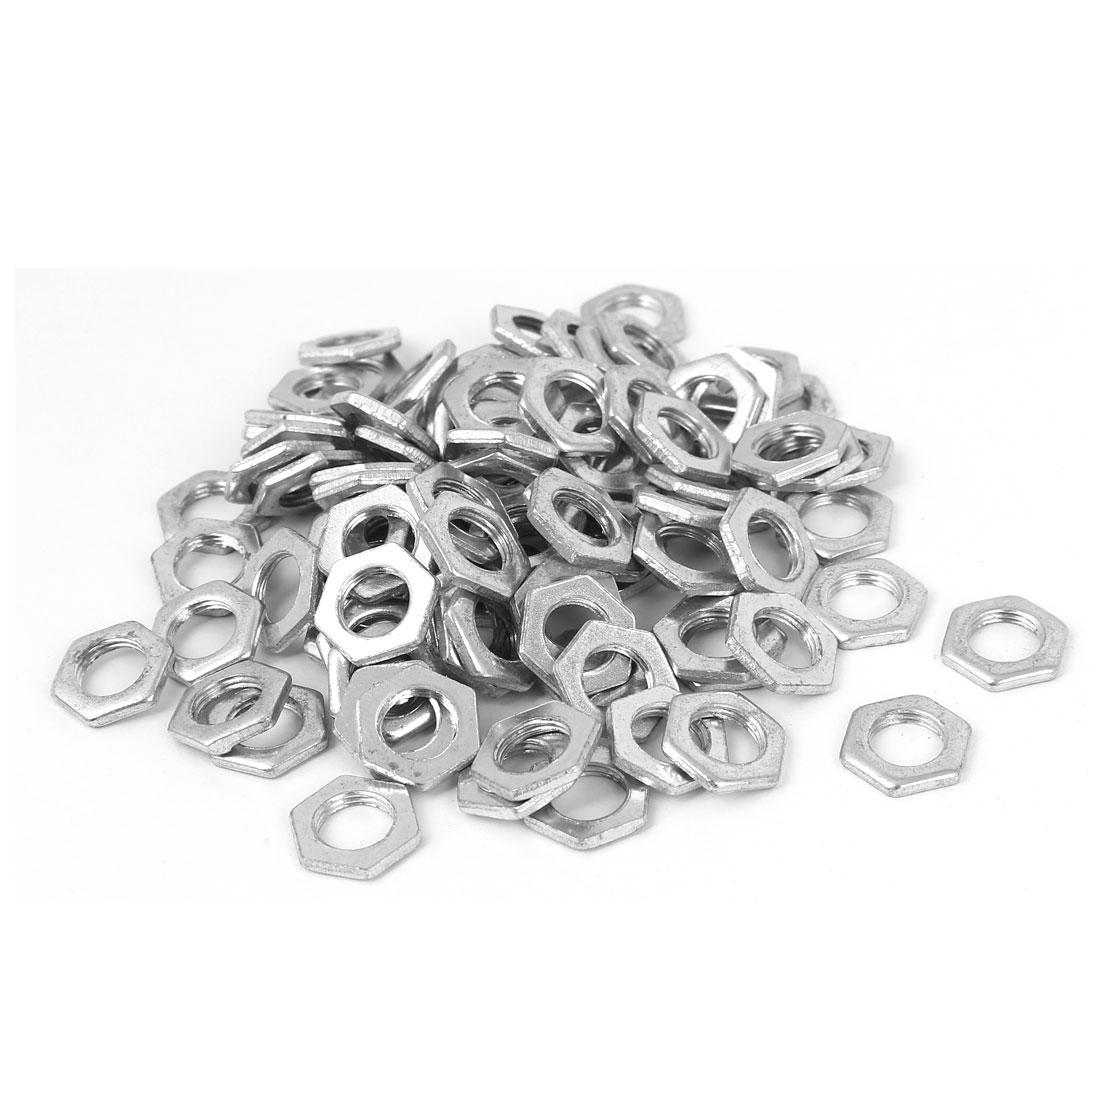 M8x2mm Zinc Plated Hex Nuts Fastener 100pcs for Screws Bolts